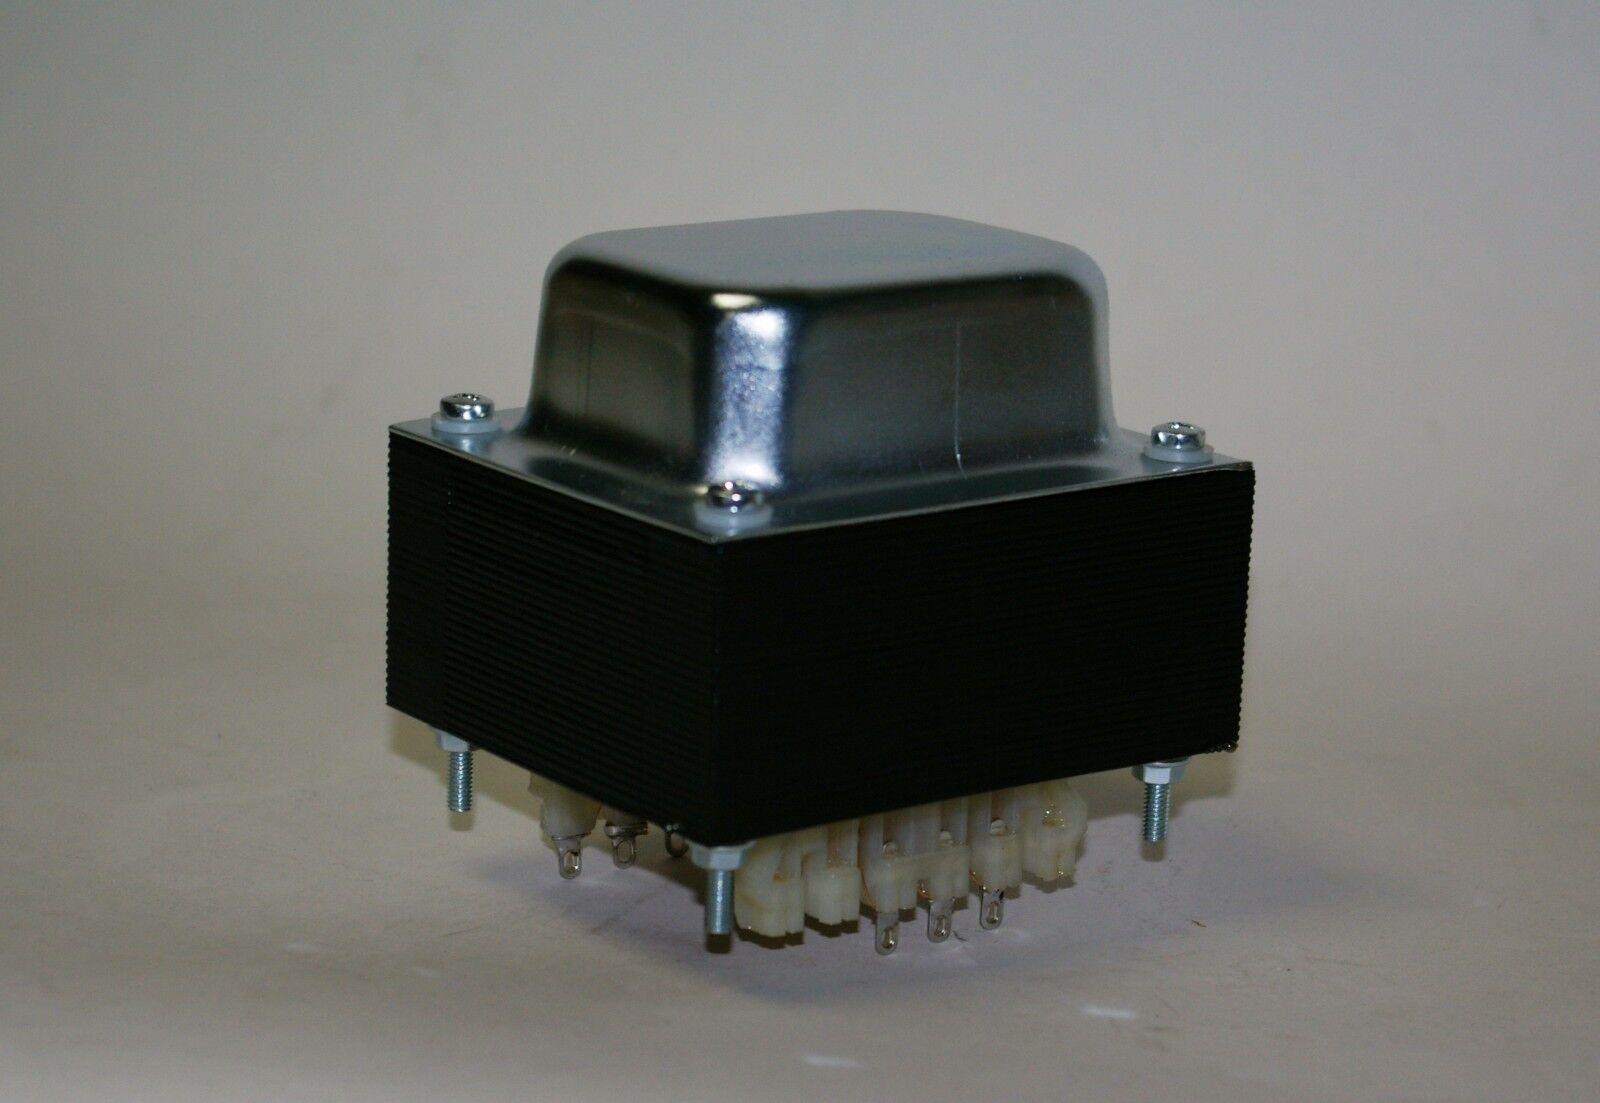 Output Transformer Marshall JCM600, JCM900, JCM2000 Rohr Gitarre Amp Replacement